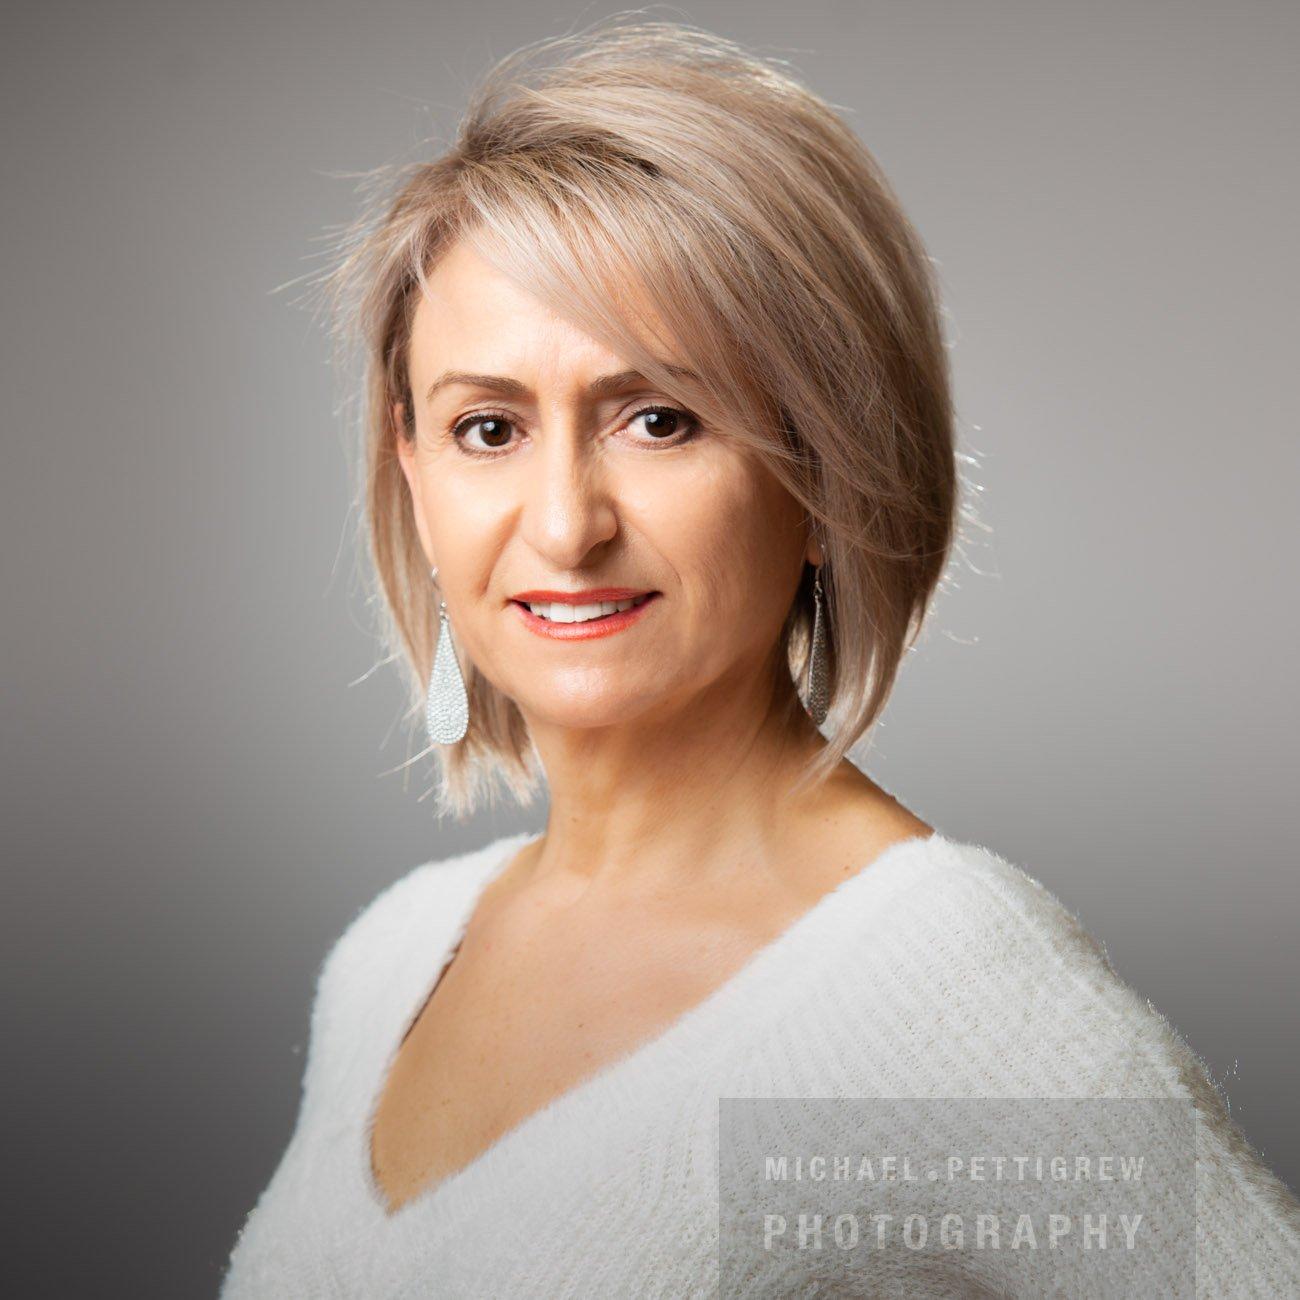 Hair Salon photography stylist team member in Falls Church, VA